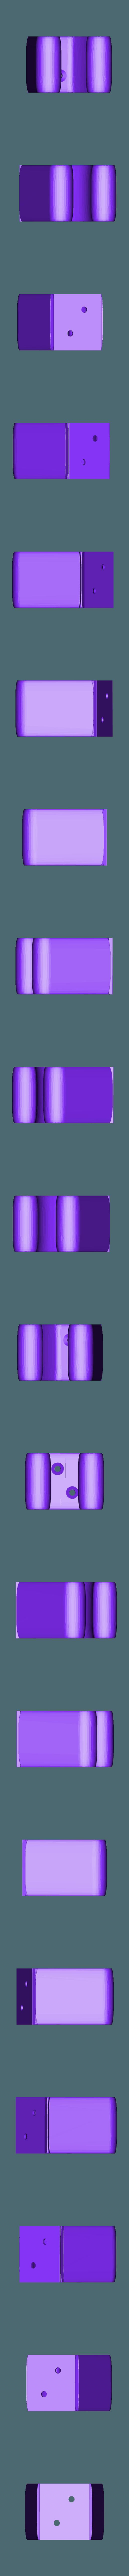 BikeRack70mmHolder.stl Download free STL file Bike Wall Holder • Design to 3D print, Hardcore3D